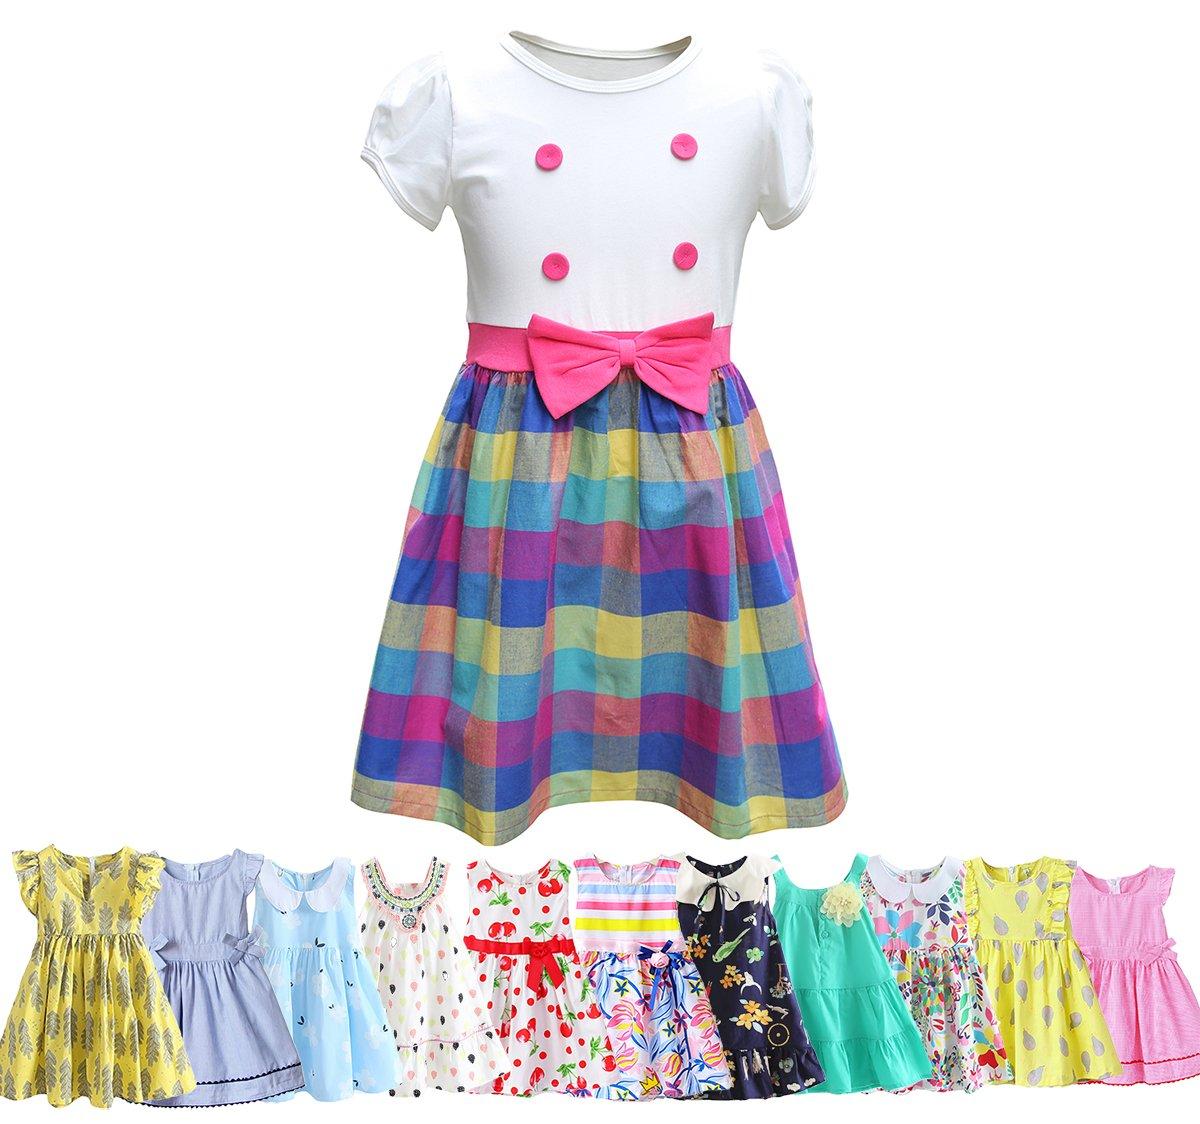 Abalaco Girls Kids 100% Cotton Soft Grid Summer Short Sleeve Sundress Casual Toddler Tutu Party Dress (Grid, 5-6 Years)